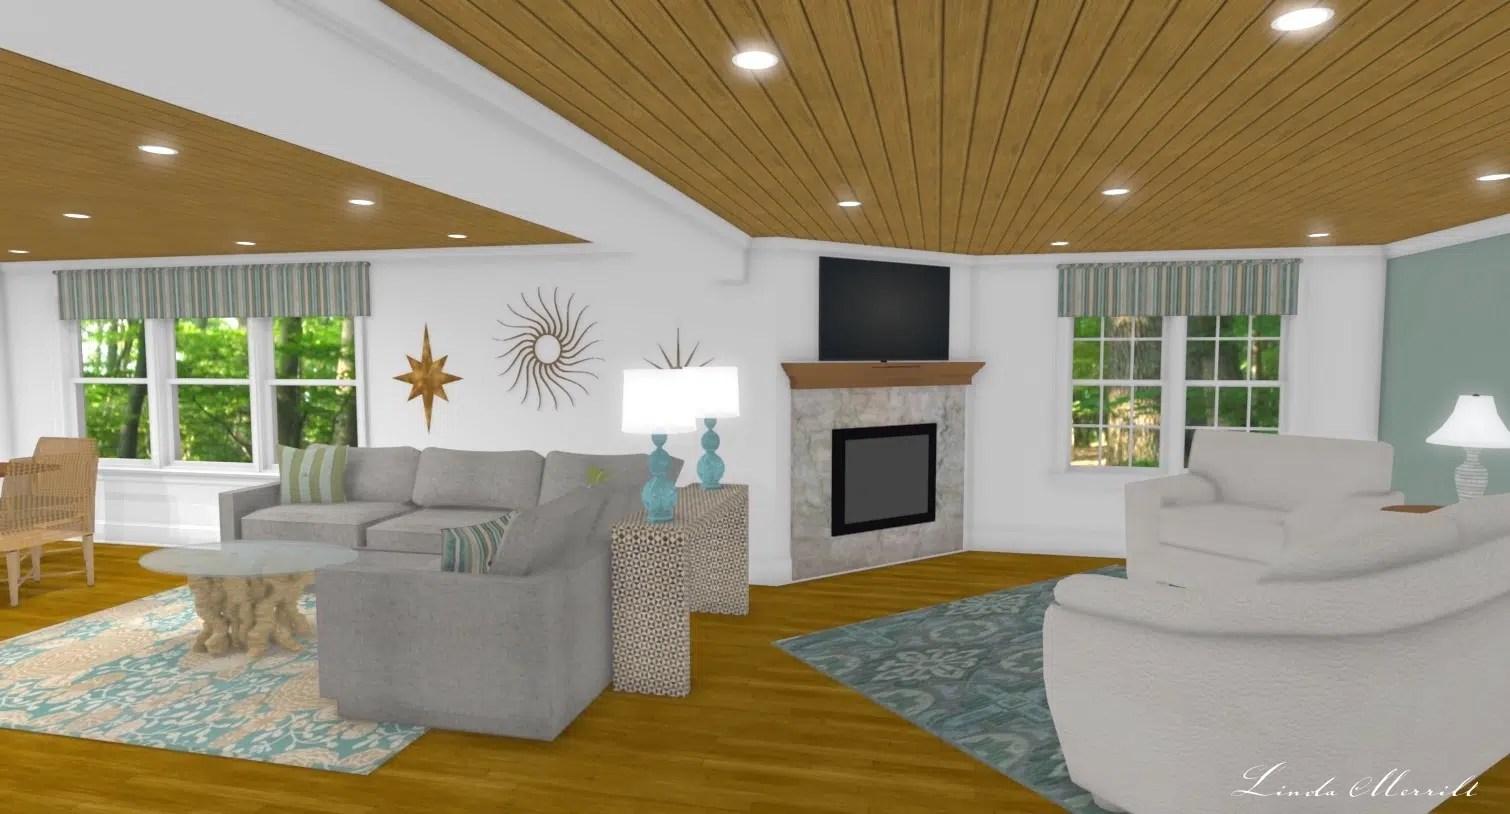 Linda Merrill interior design renderings sunroom family room room 1